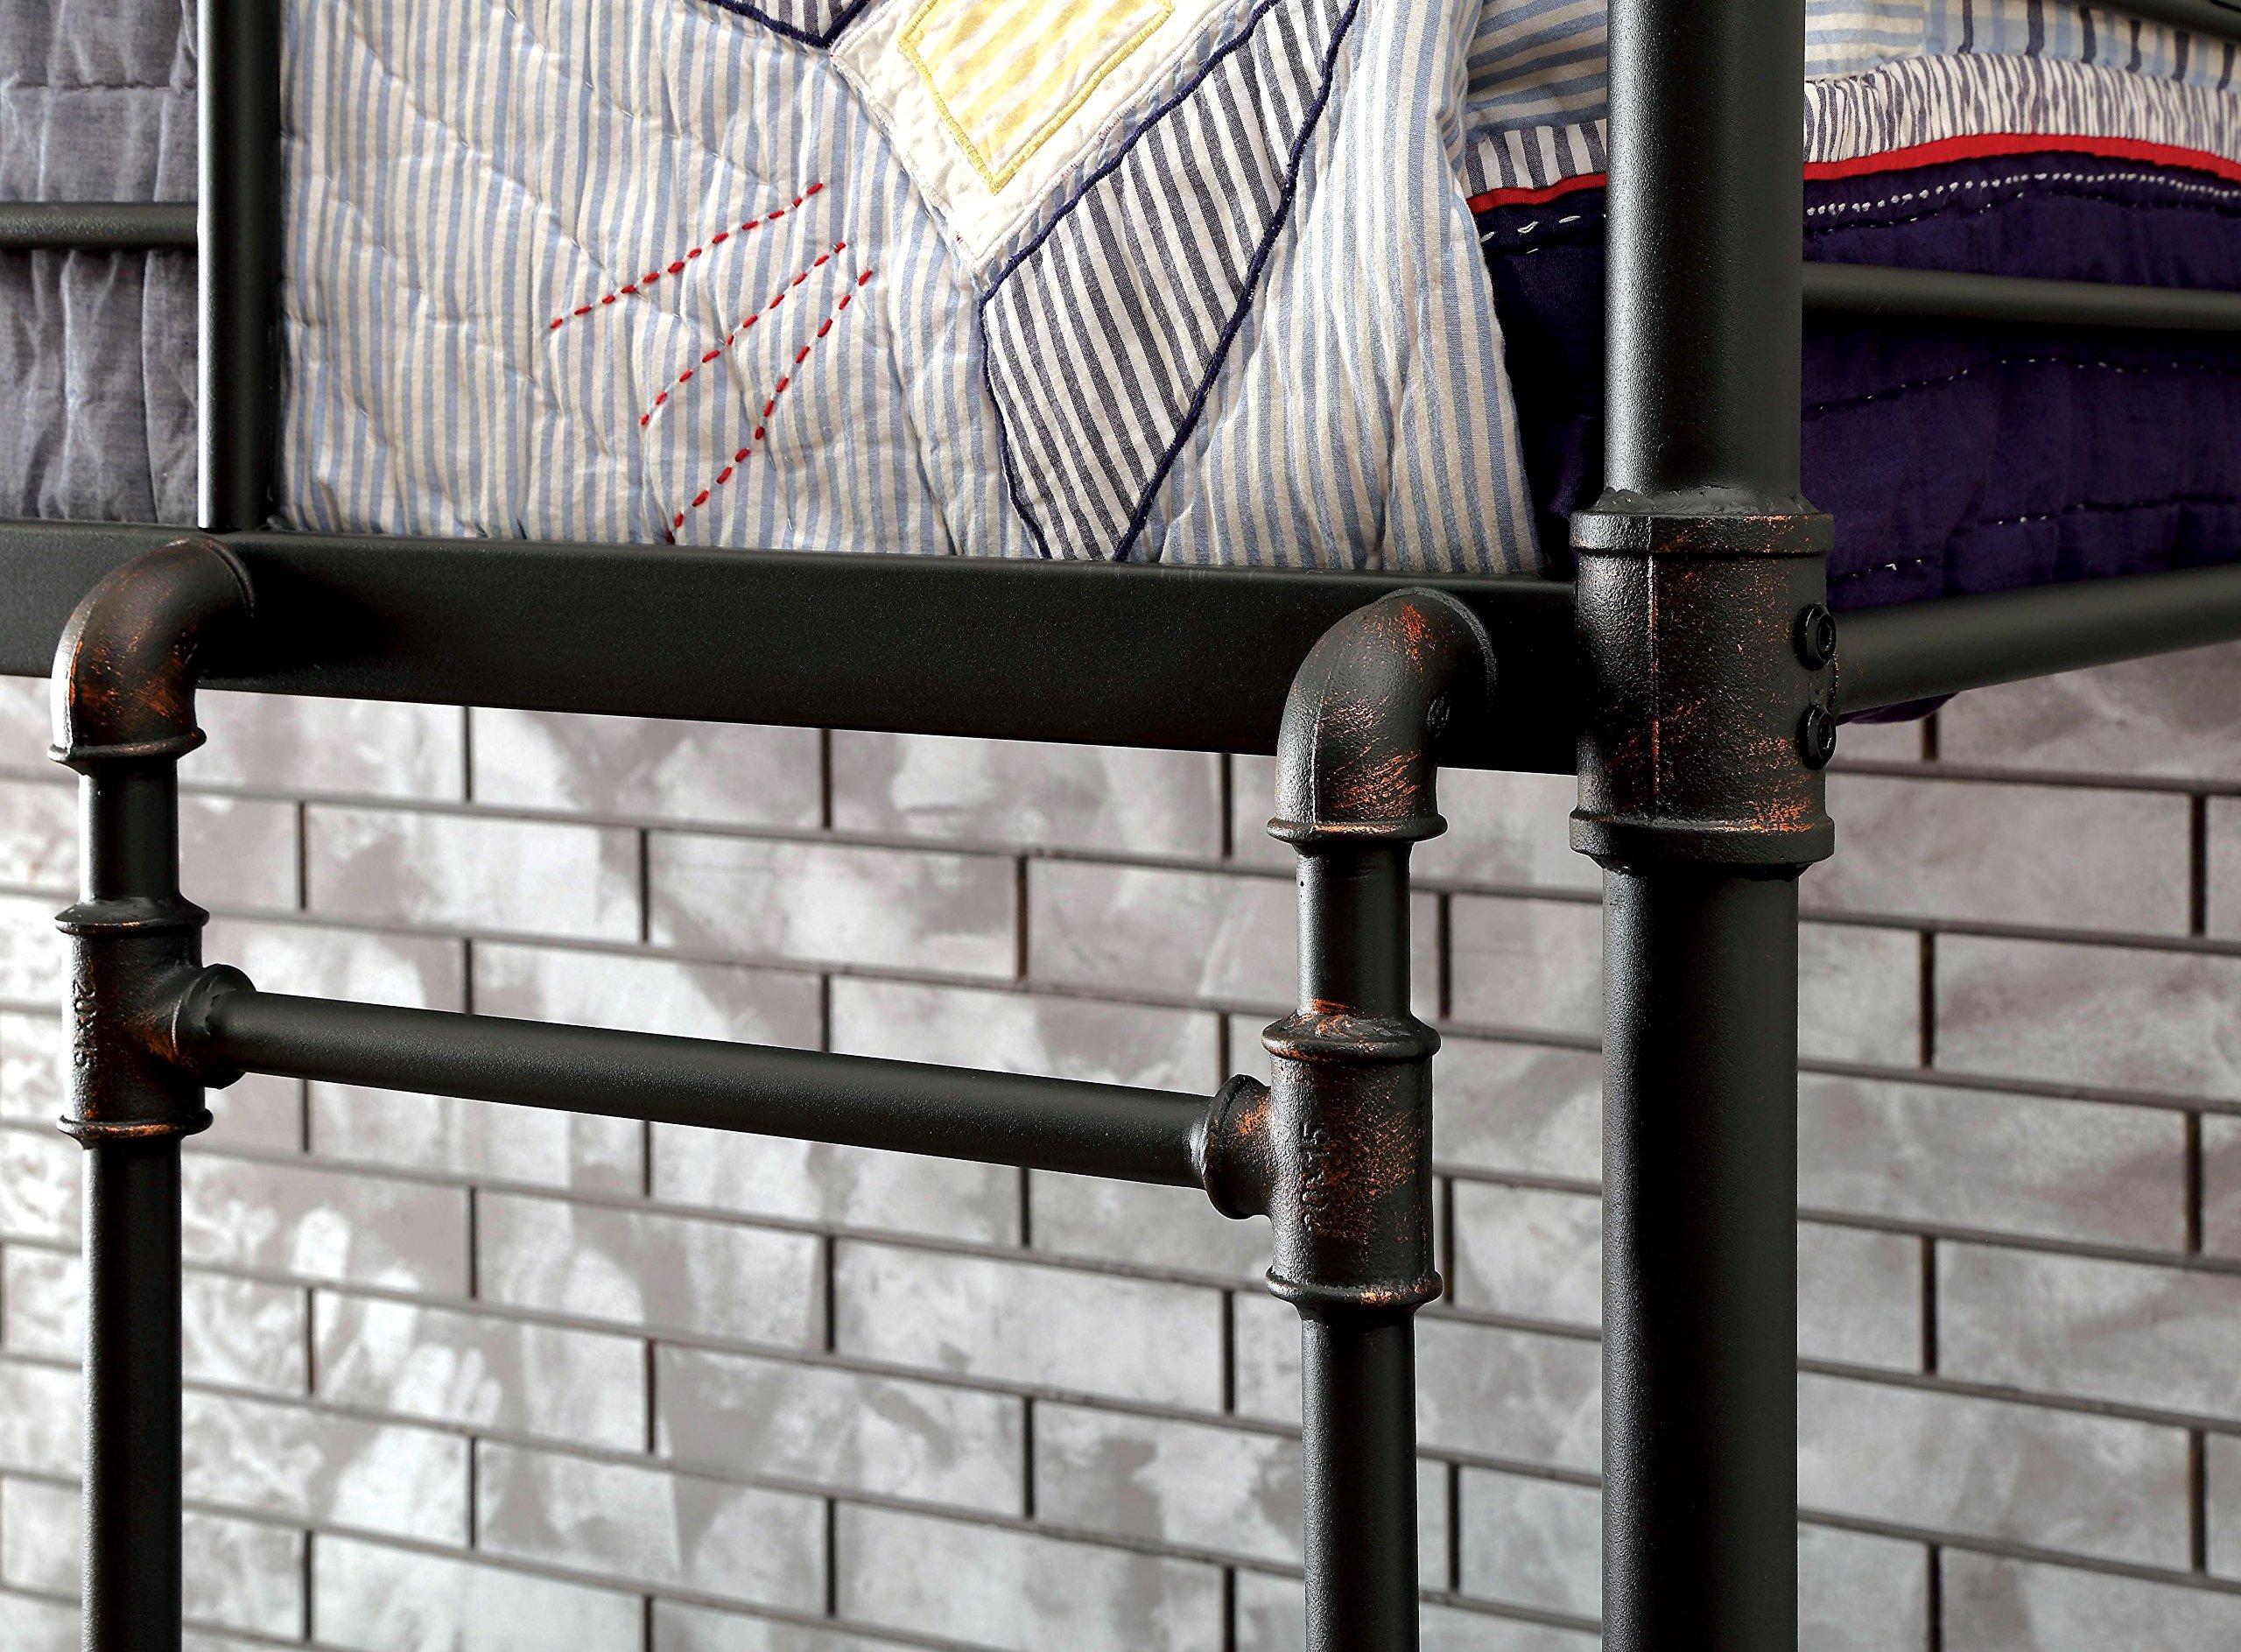 HOMES: Inside + Out IDF-BK913FQ Xondro Bunk Bed Childrens Frames, Full / Queen